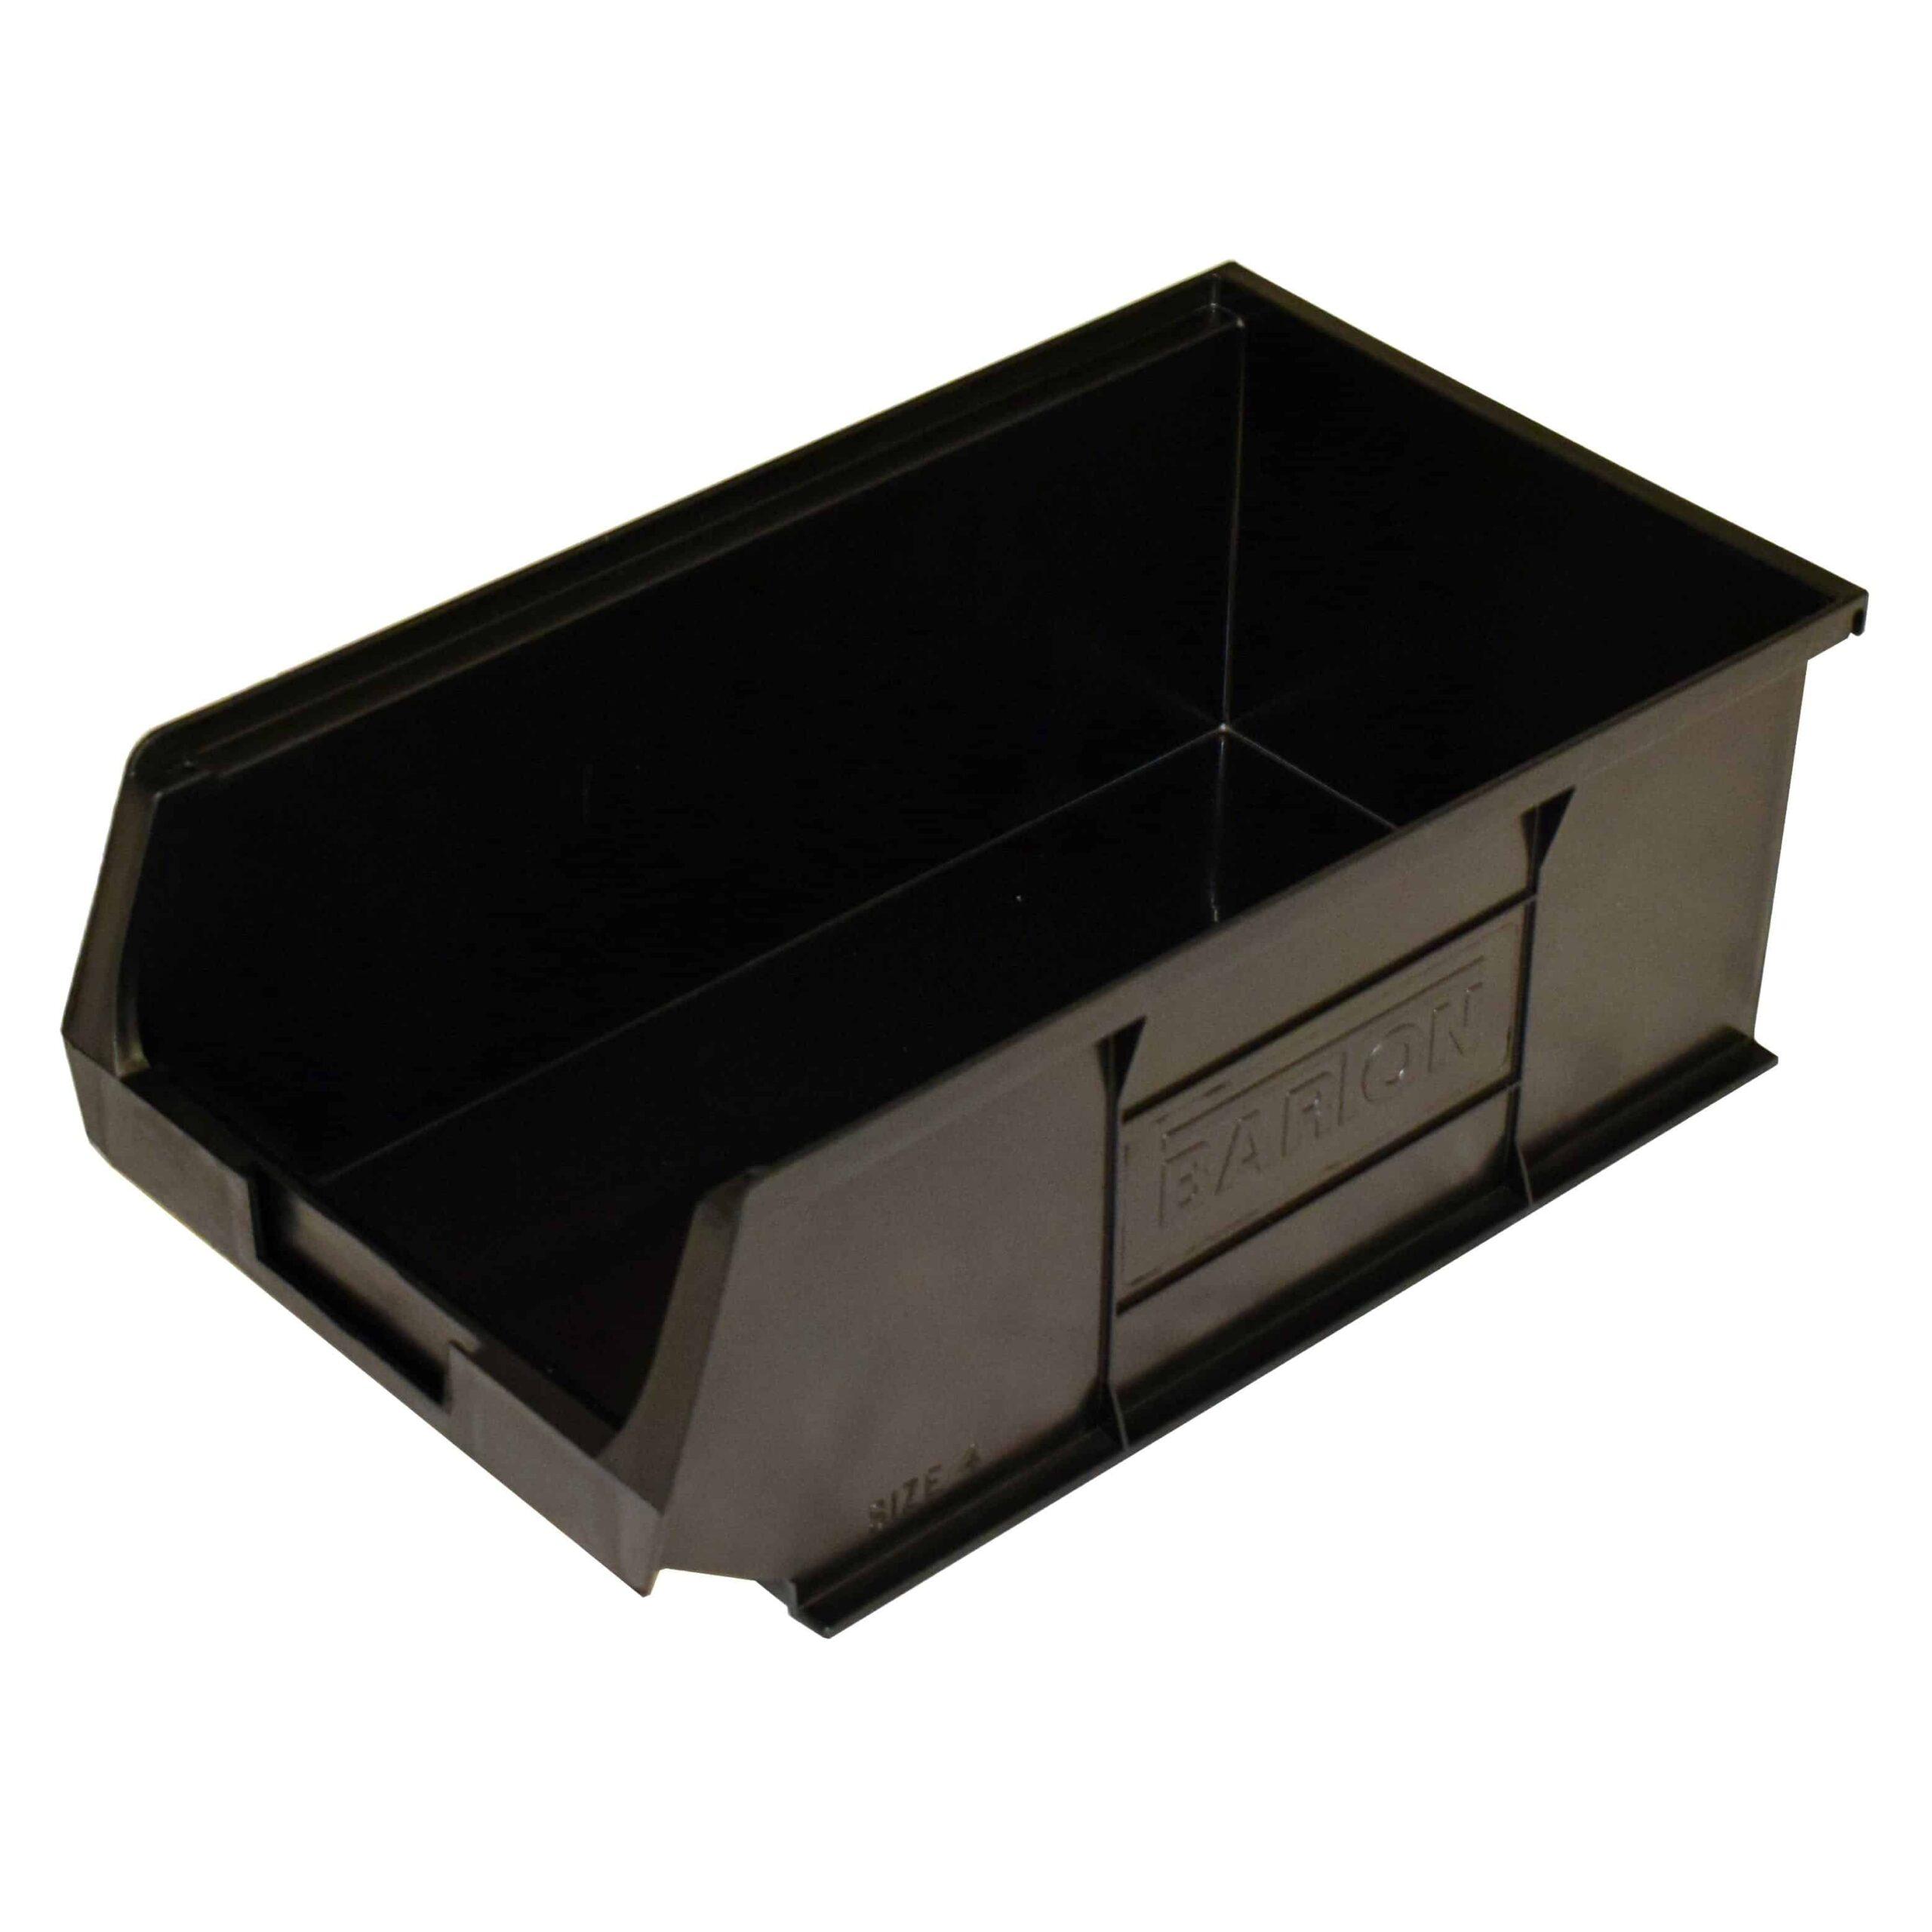 Barton STC4 Black Anti-Static Containers